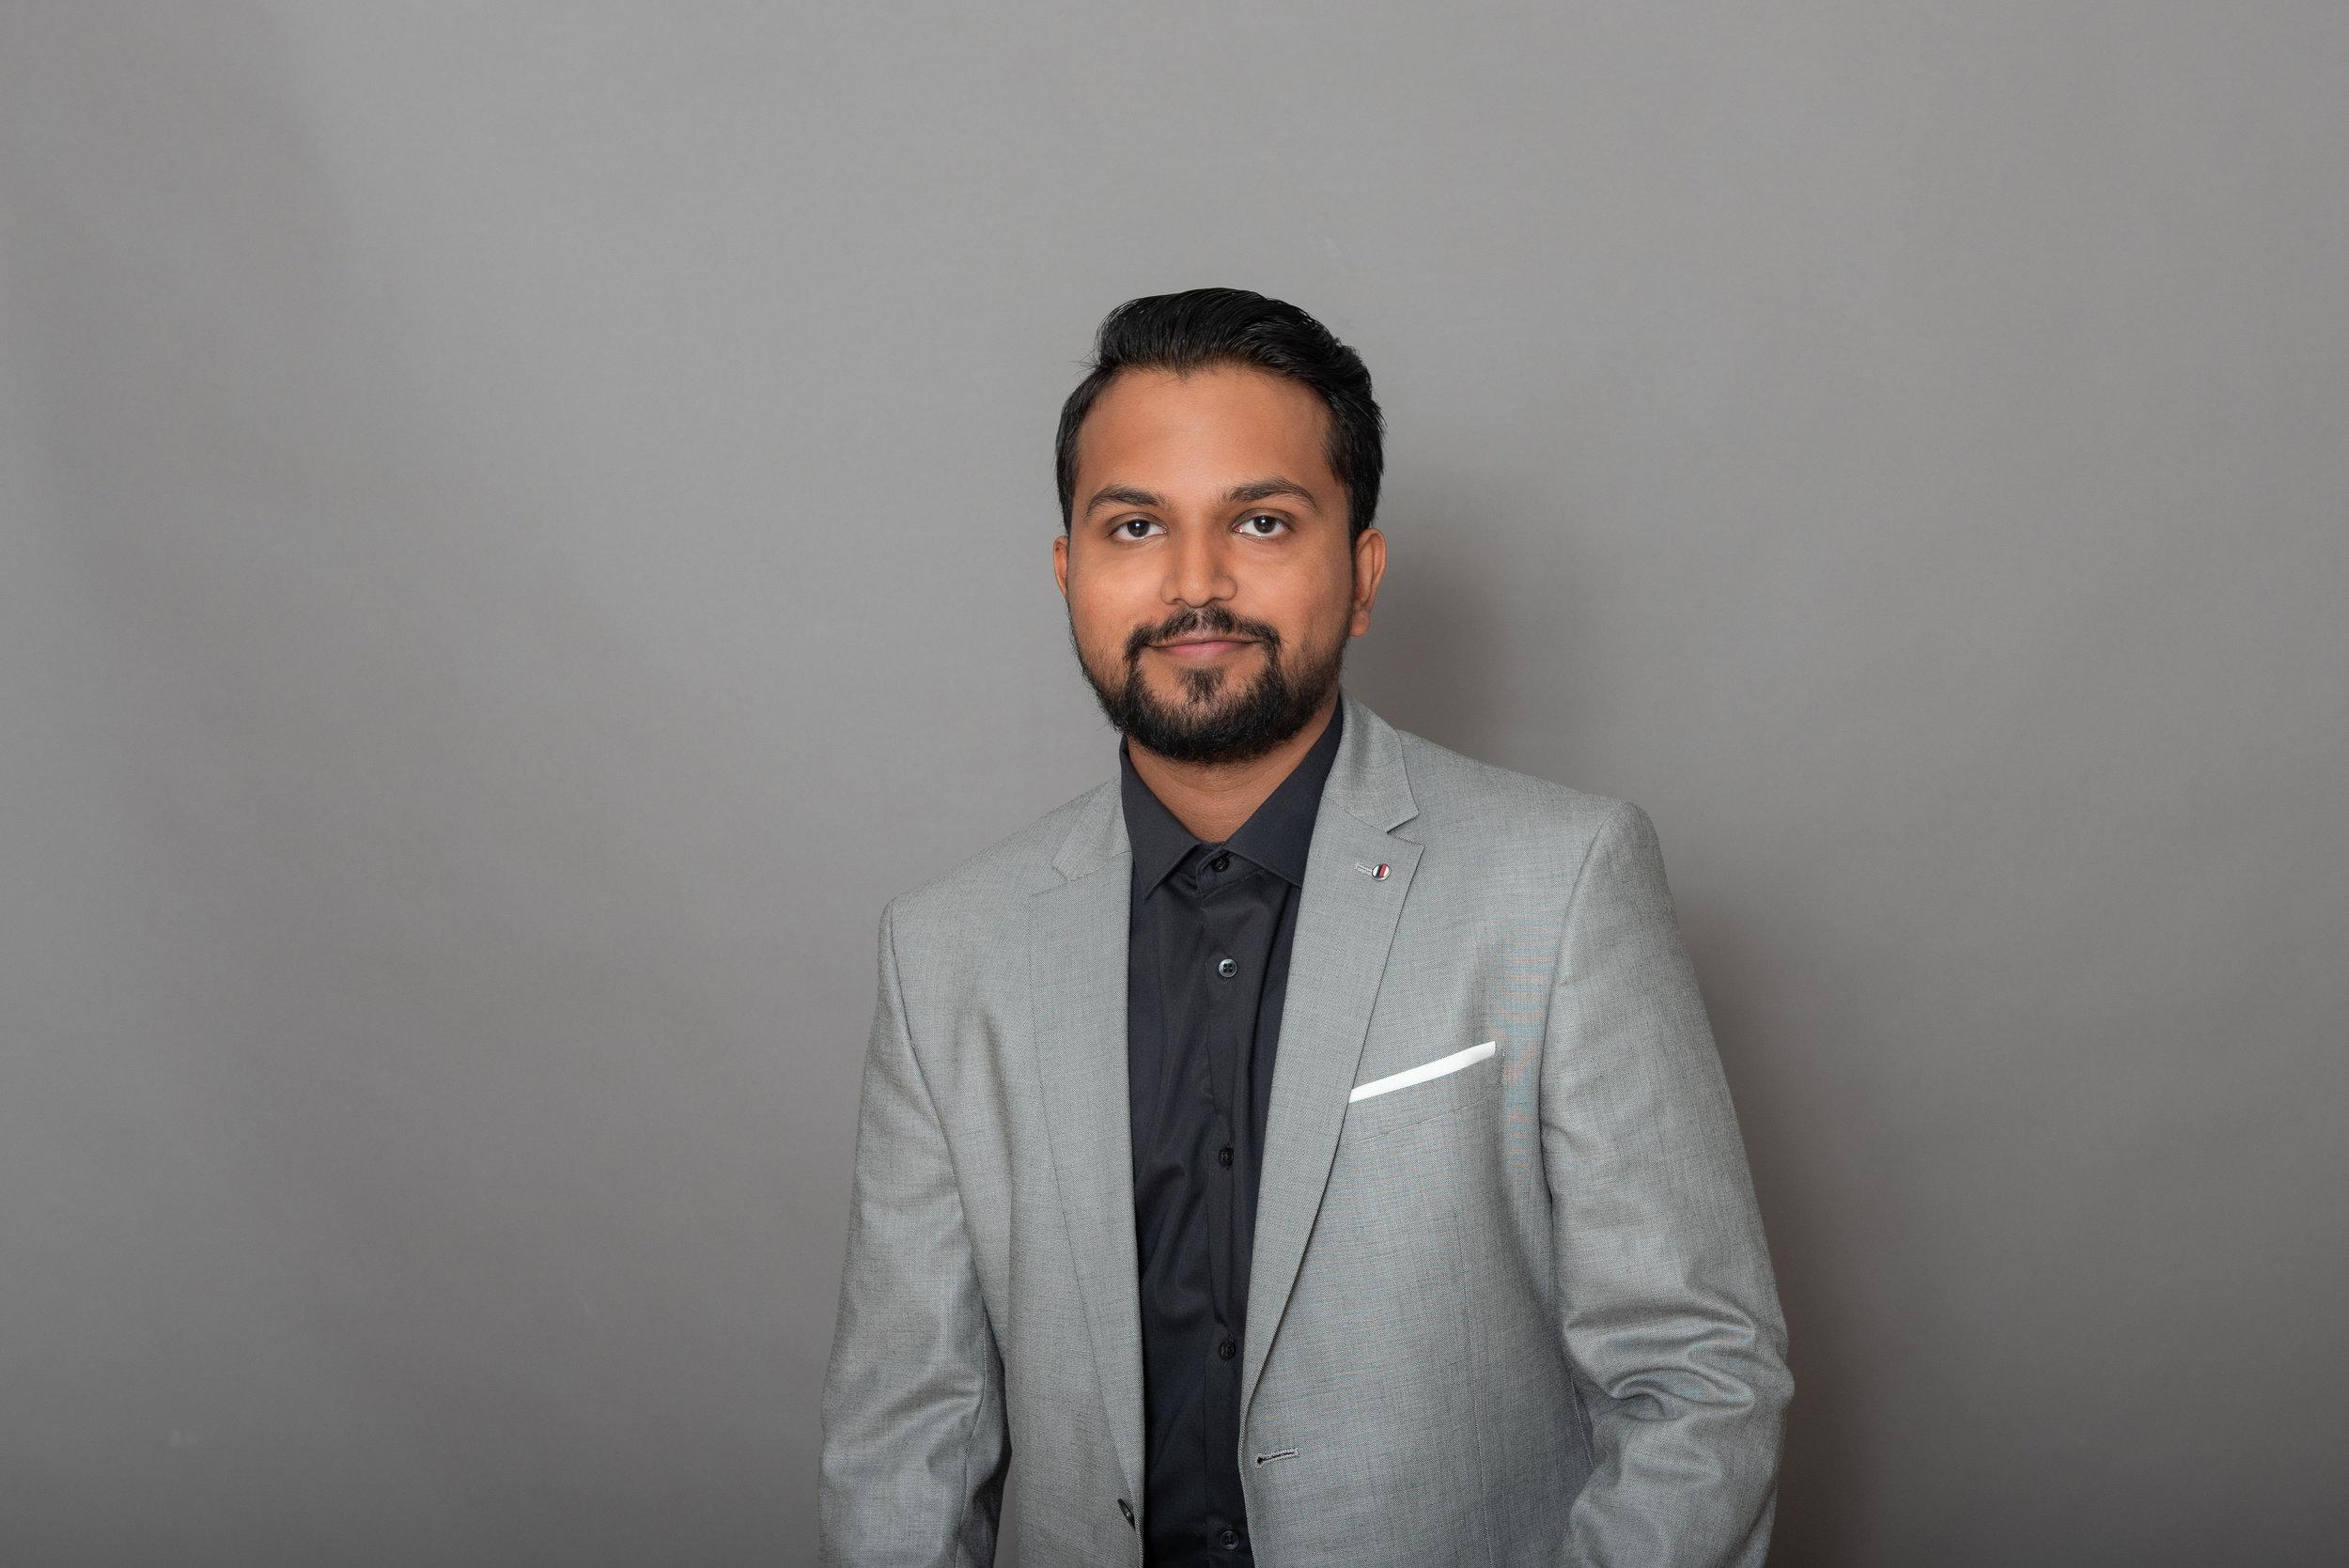 Mayuran Muthulingam Sachbearbeiter Buchhaltung & HR